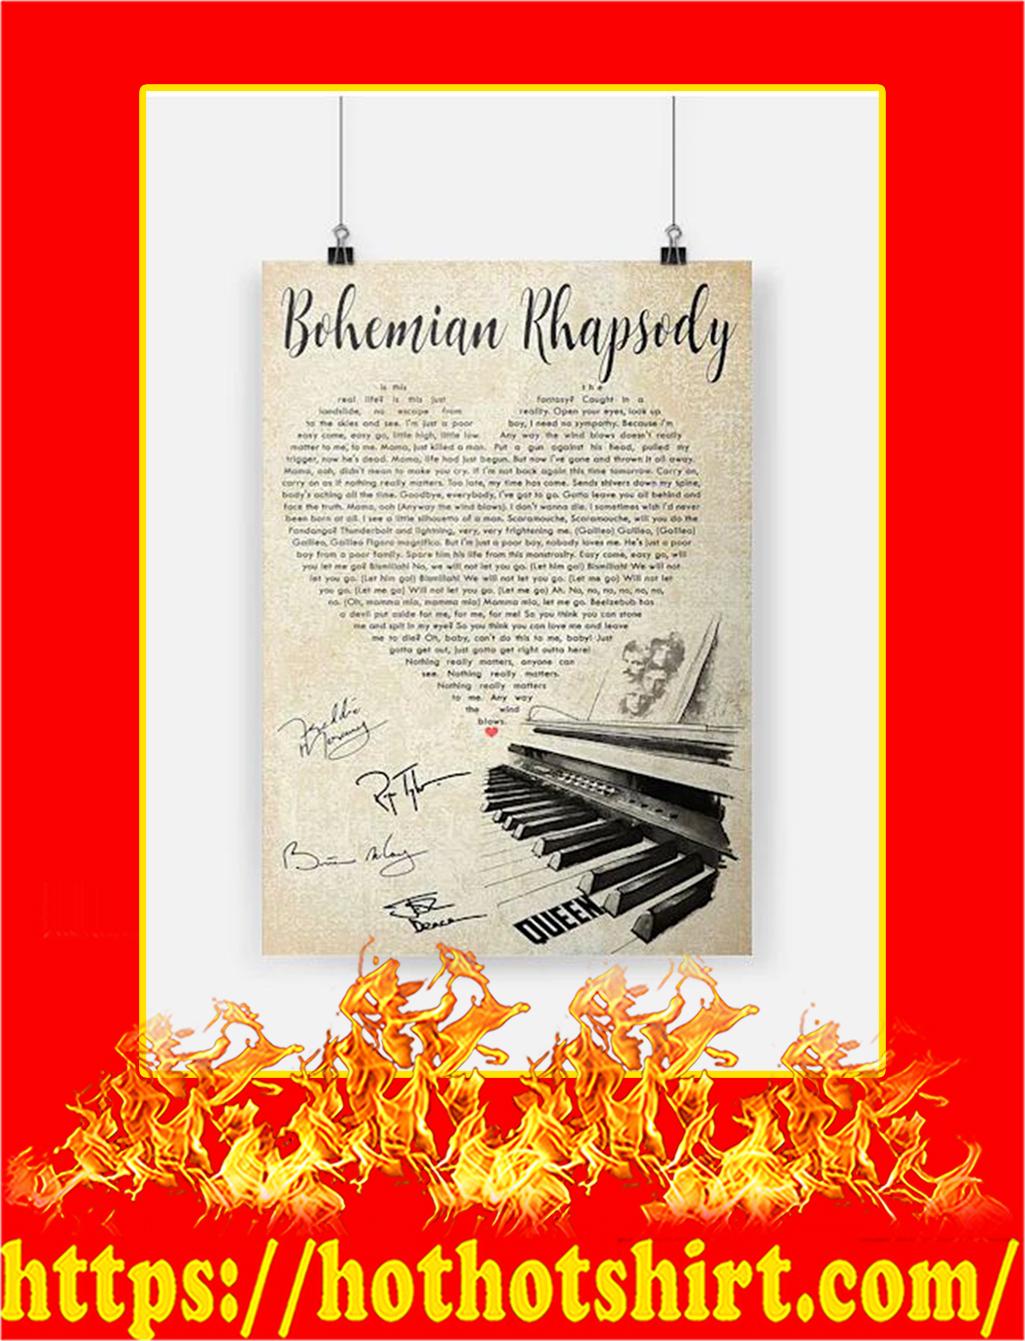 Bohemian Rhapsody Queen Heart Poster - A3